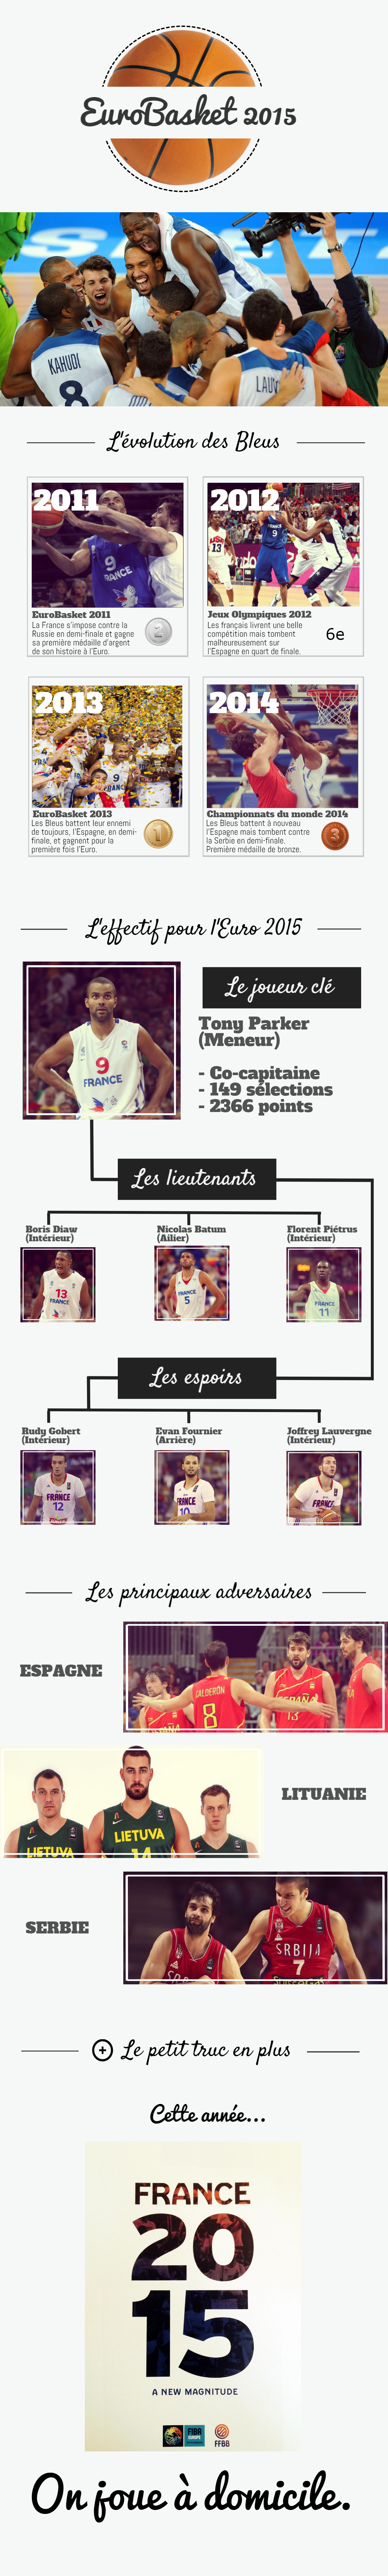 infographie eurobasket france bleus 2015